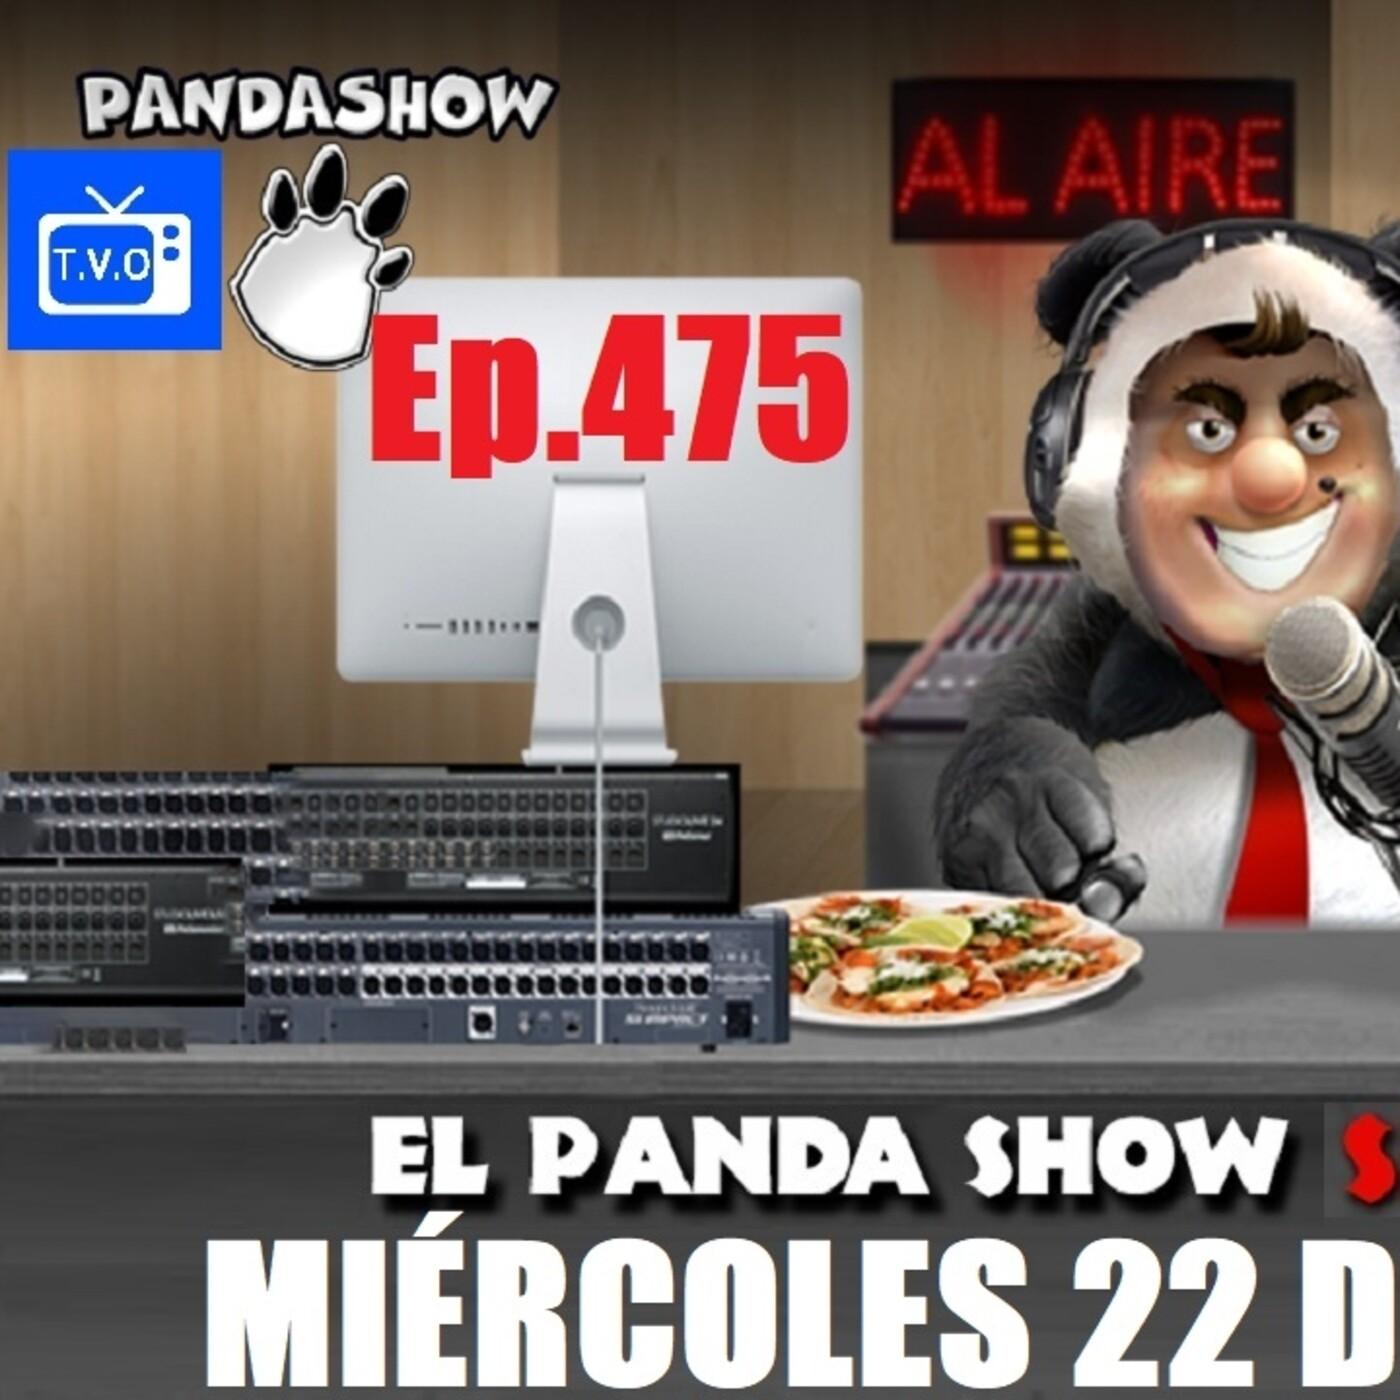 EL PANDA SHOW Ep. 475 MIÉRCOLES 22 DE JULIO 2020